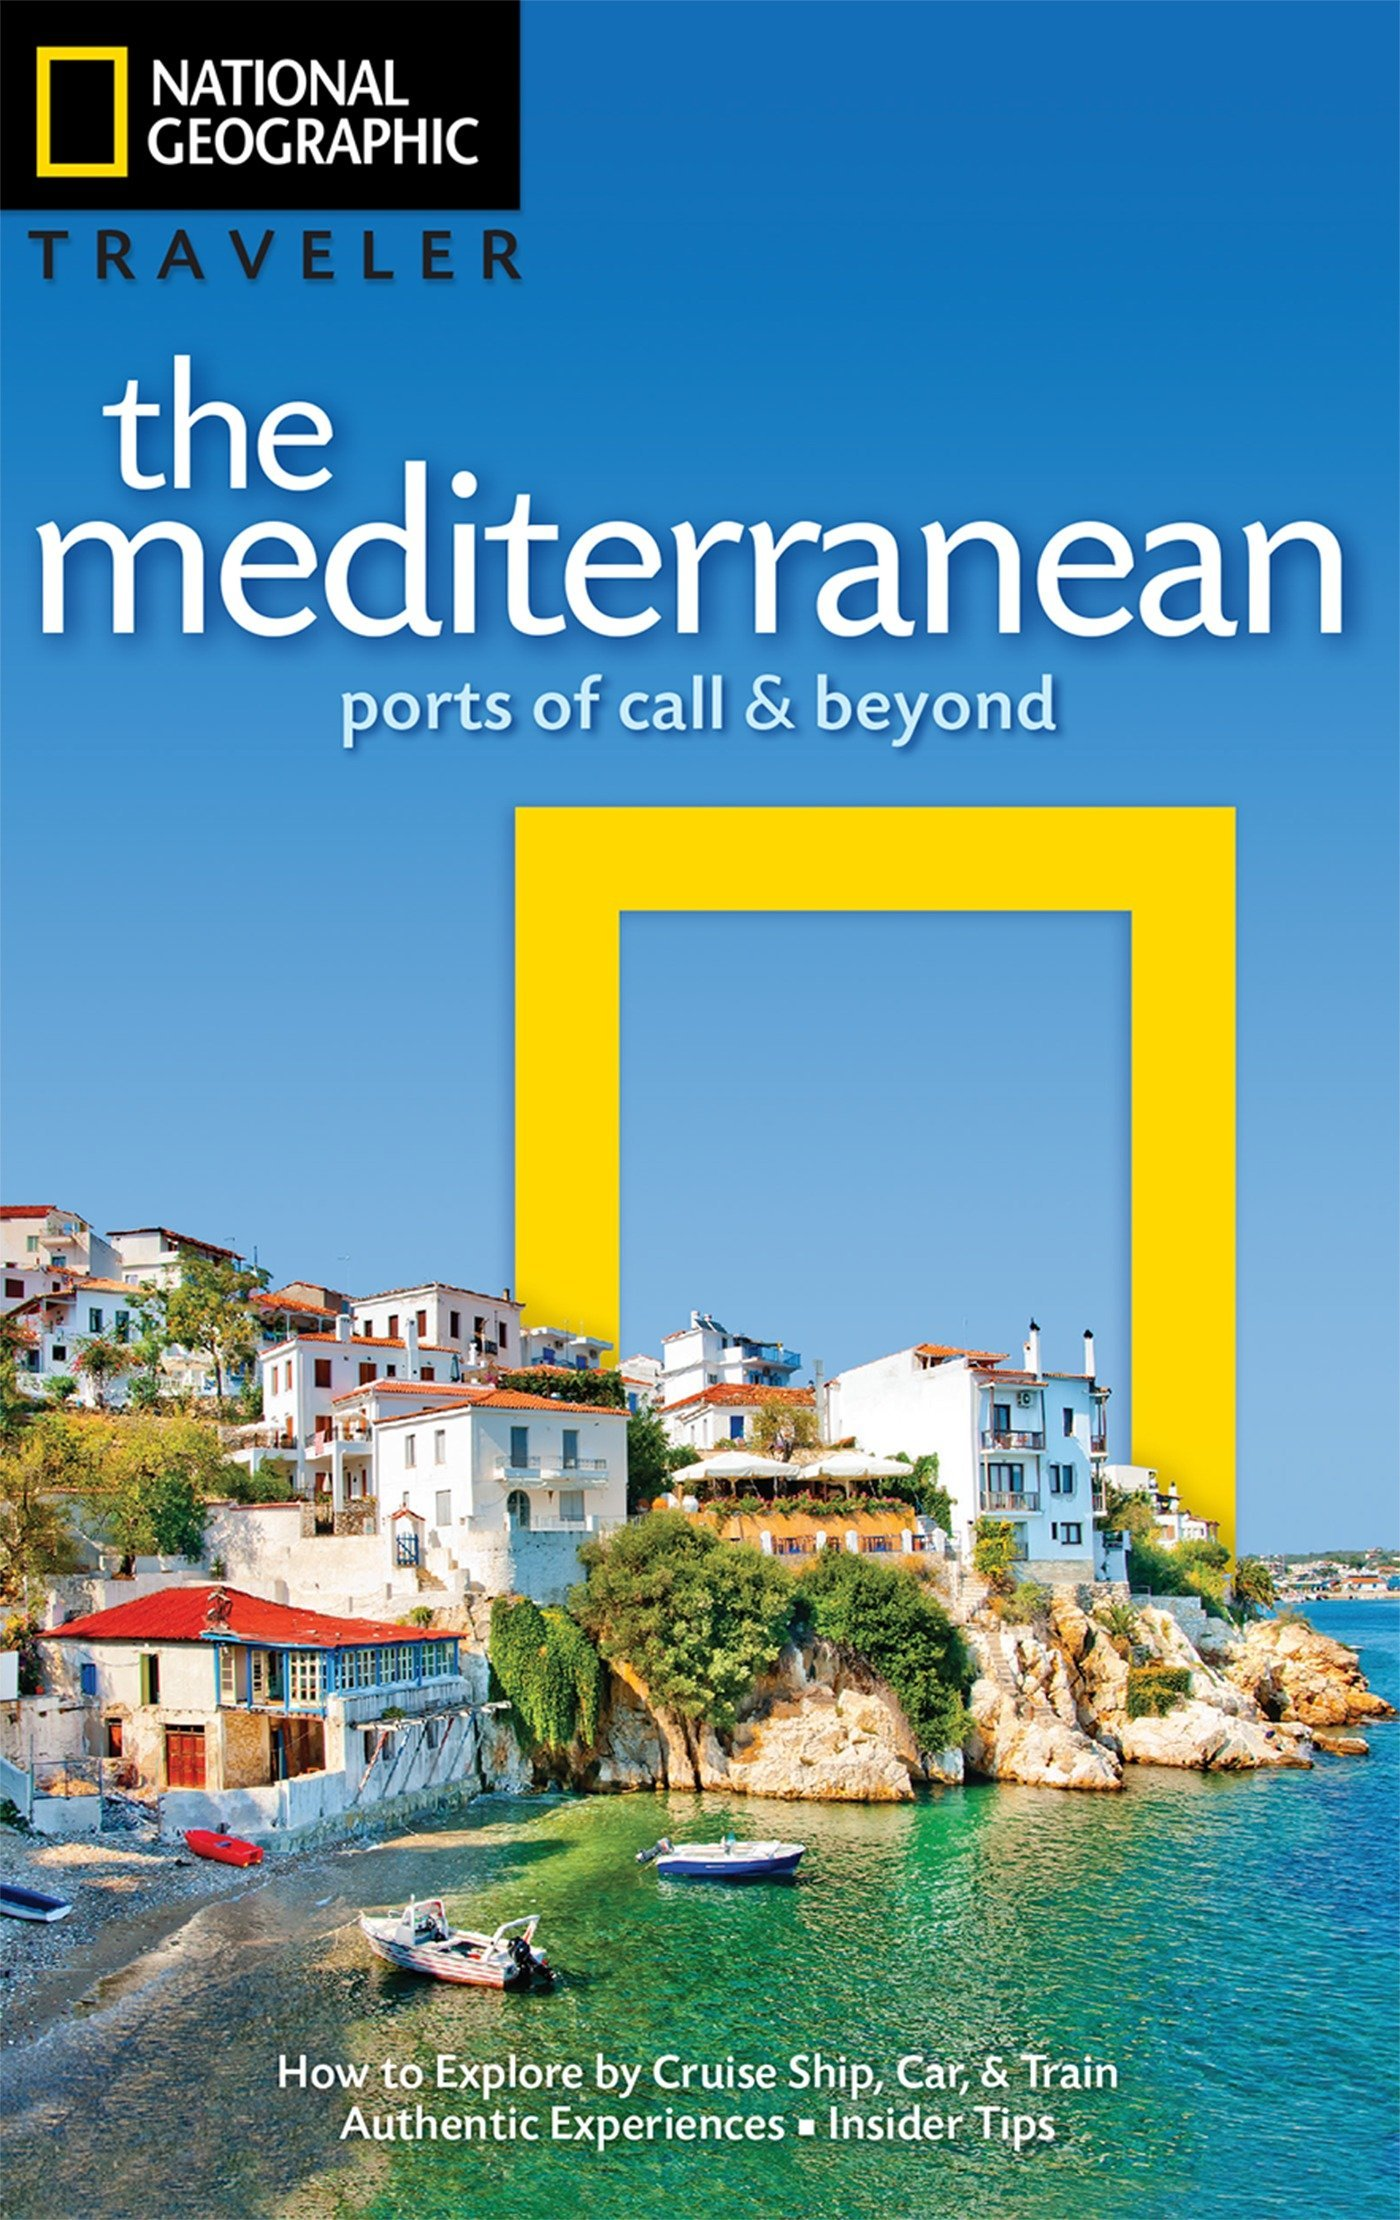 National Geographic Traveler: The Mediterranean: Ports of Call and Beyond by National Geographic Society